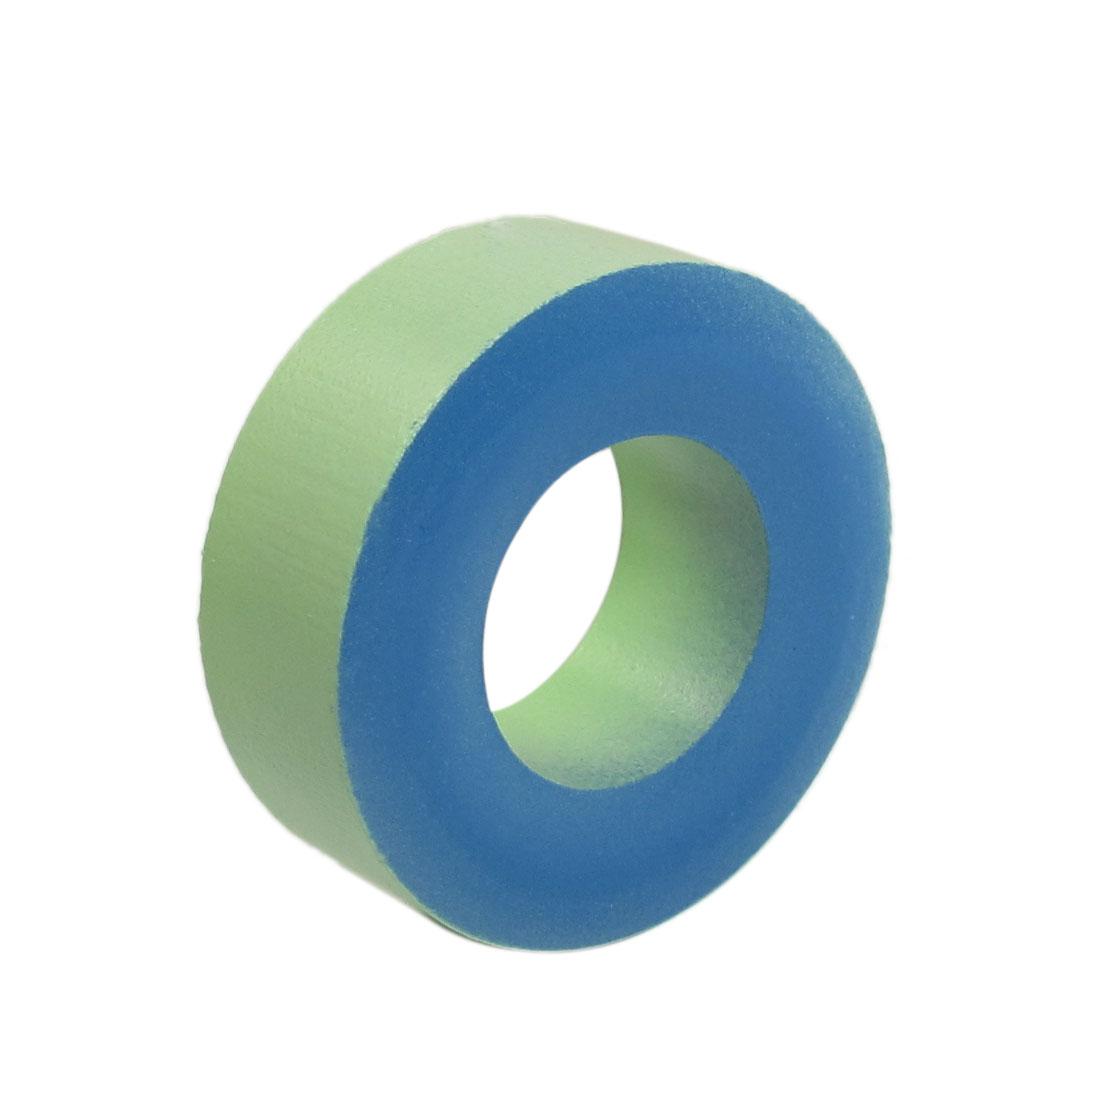 Pale Green Blue Iron Power Ferrite Toroid Core 47mm Outside Diameter